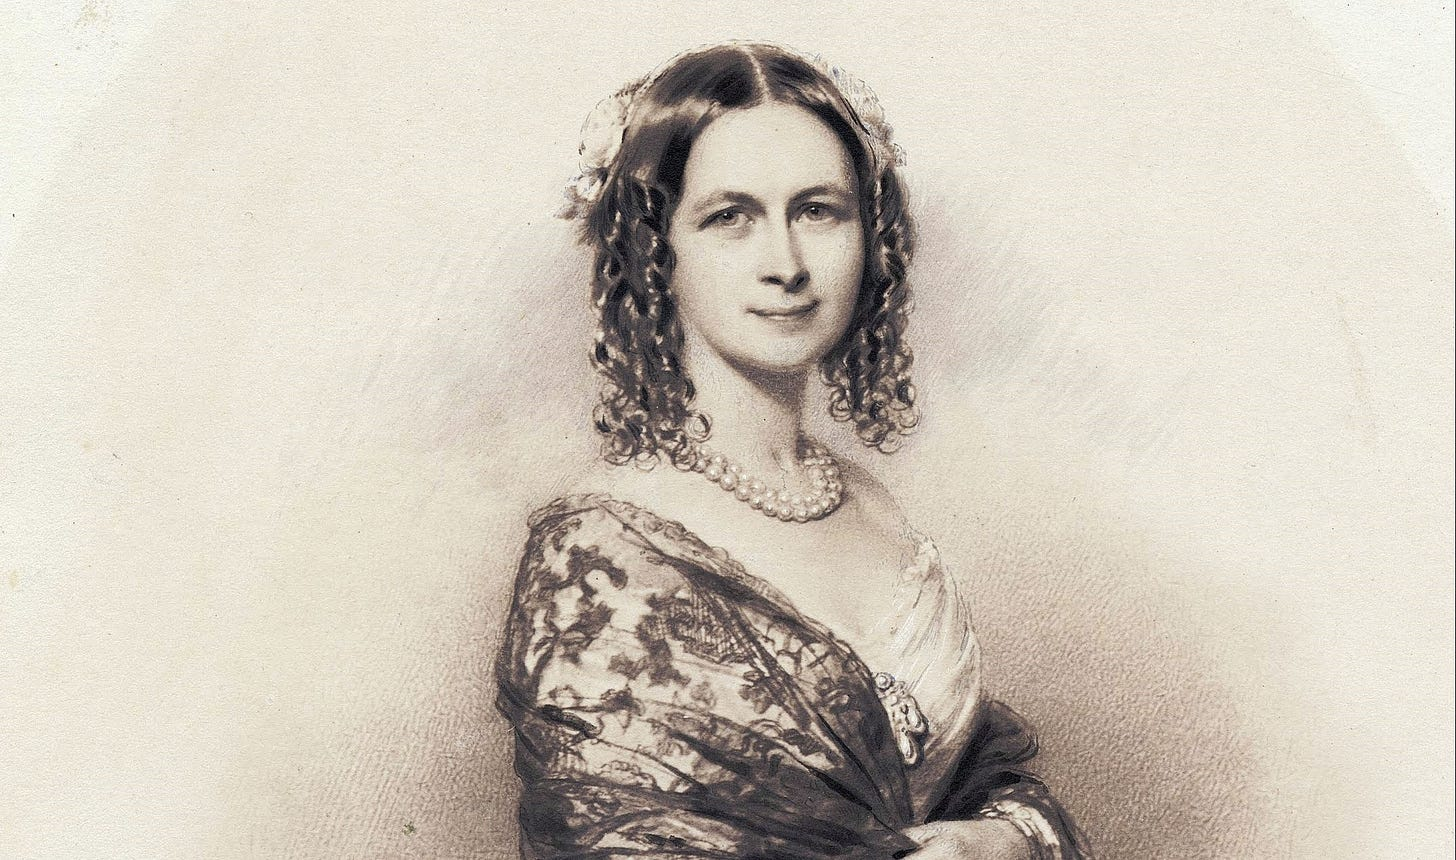 Portrait of opera singer Jenny Lind (1820–1887)